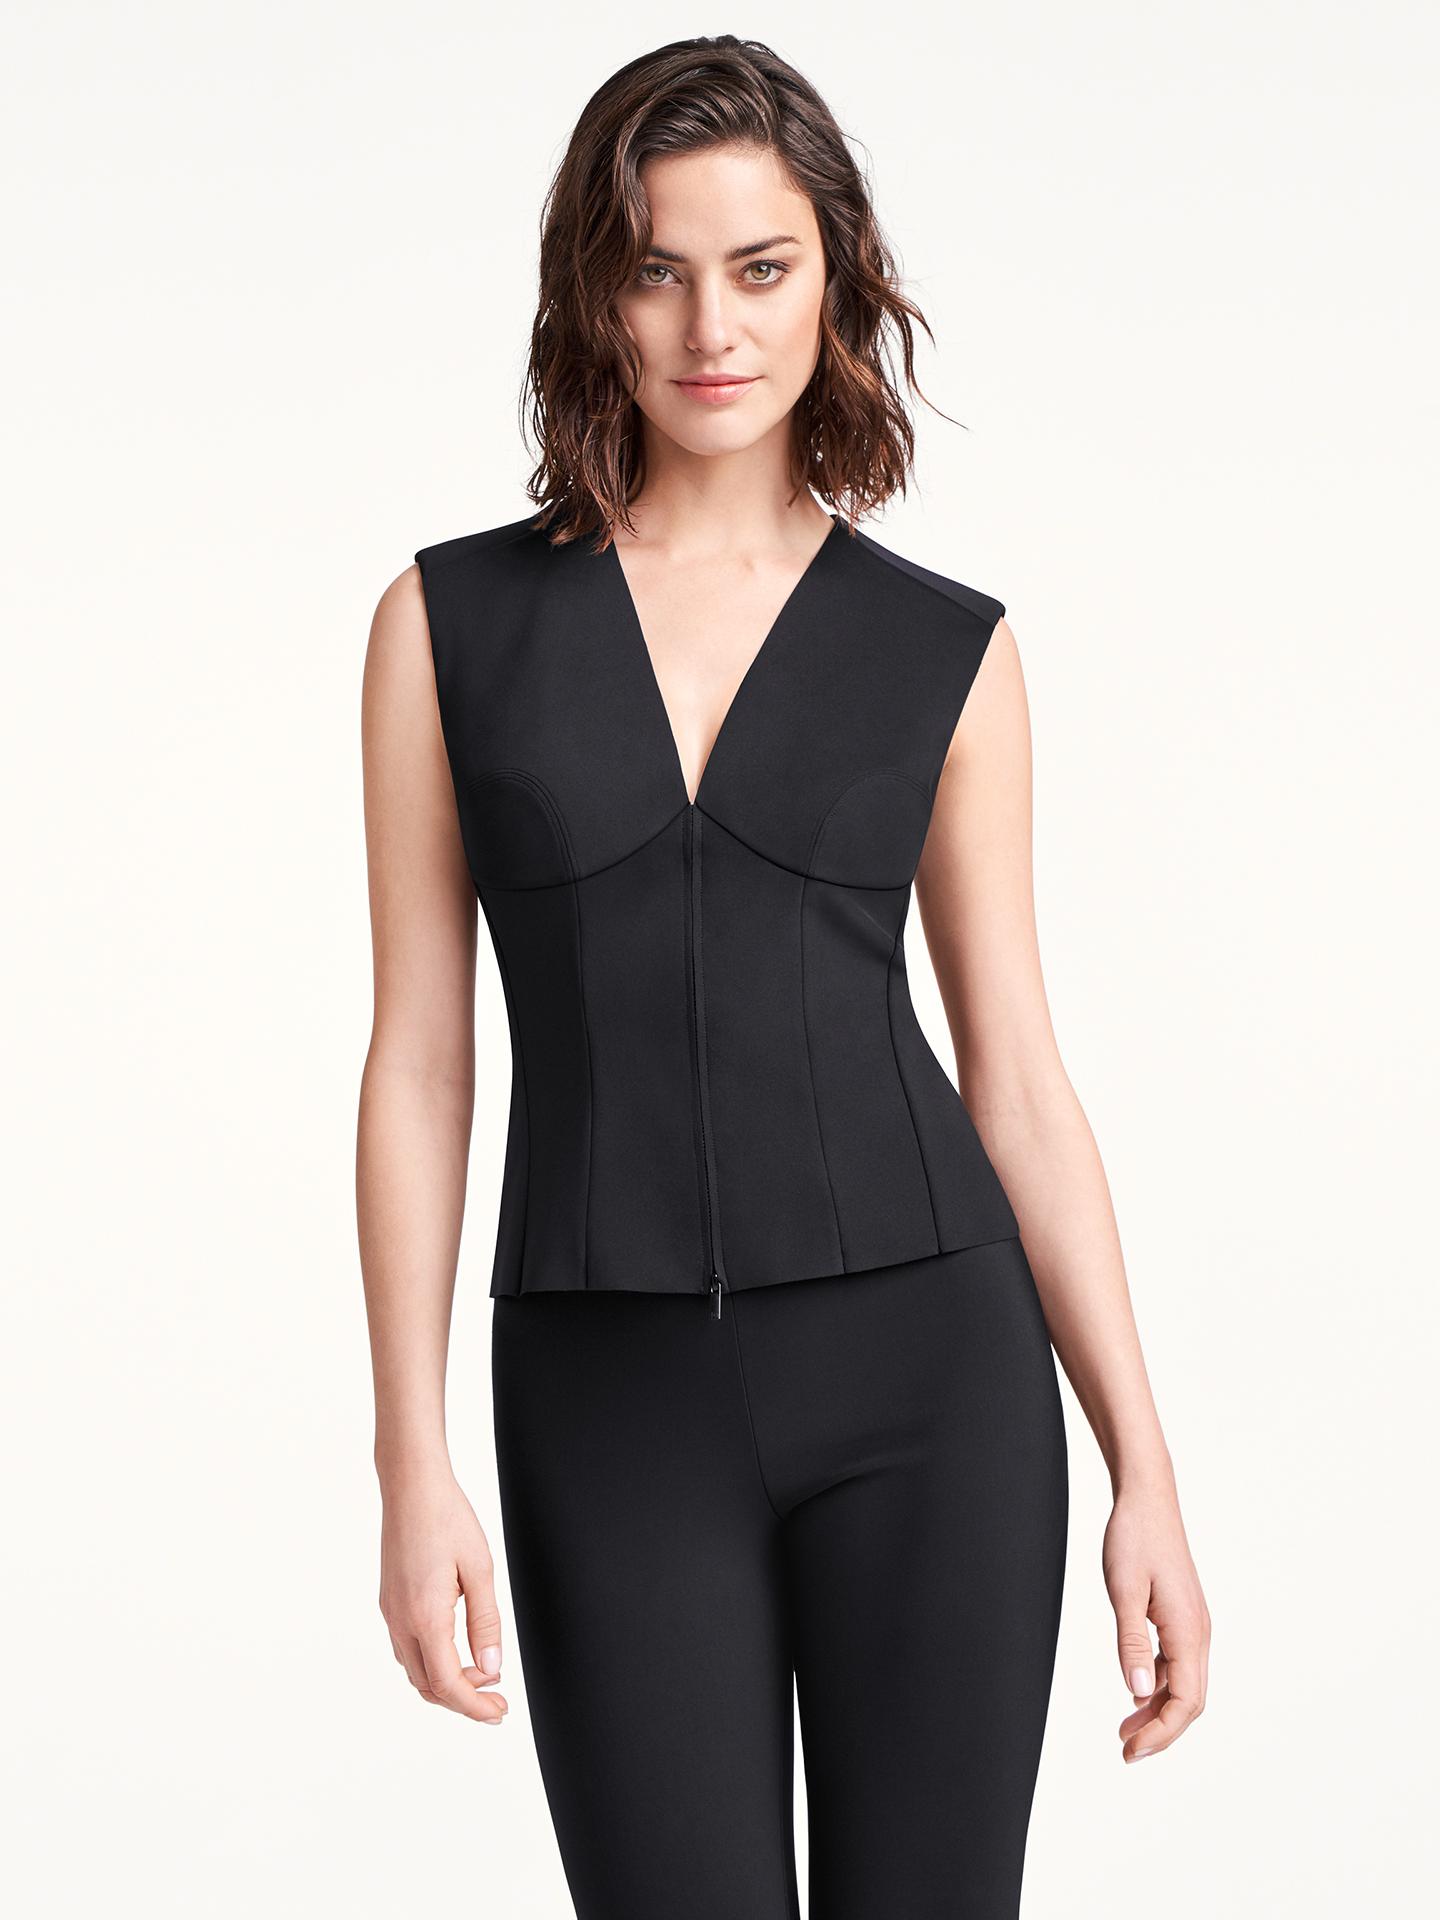 Wolford Apparel & Accessories > Clothing > Abbigliamento Donna Sarah Vest